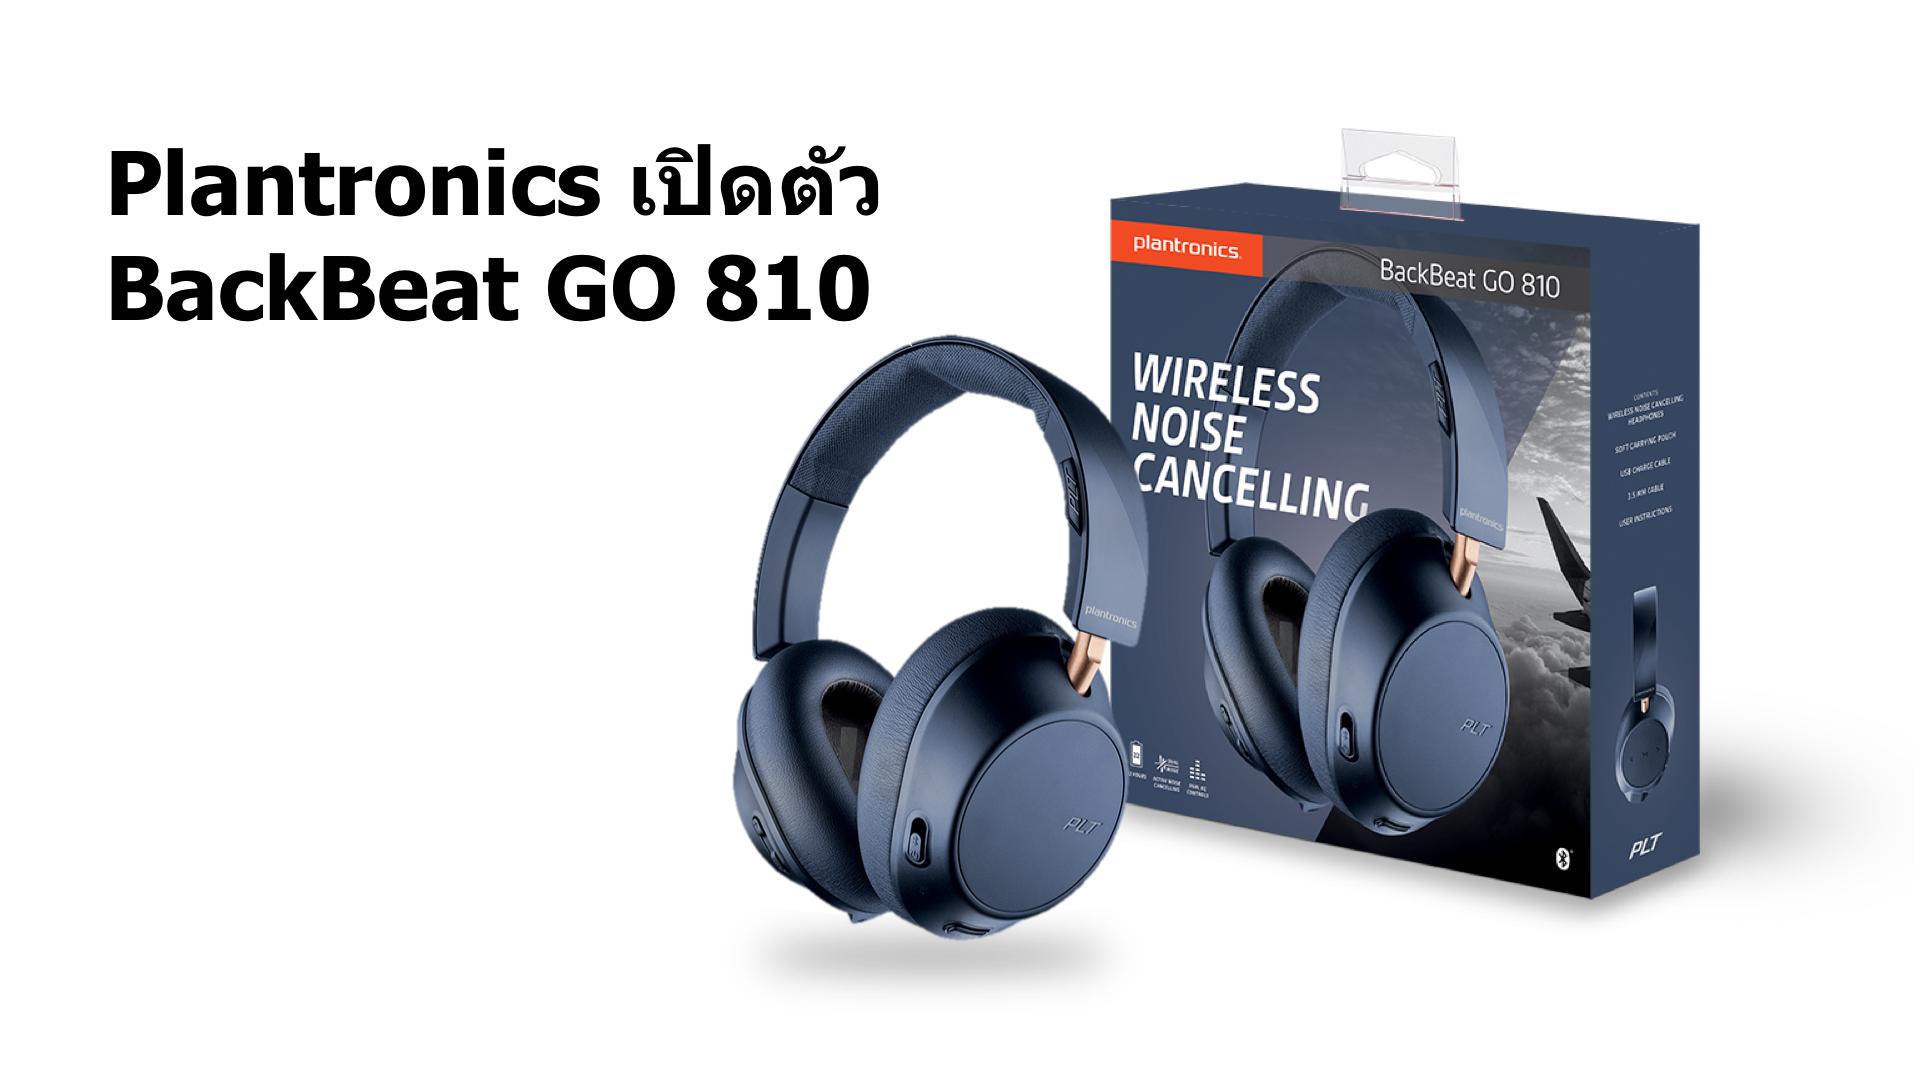 "Plantronics เปิดตัว ""BackBeat GO 810"" หูฟังบลูทูธสเตอริโอไร้สายระบบ ANC เอาใจ Music Lover ให้ได้กรี๊ด 1"